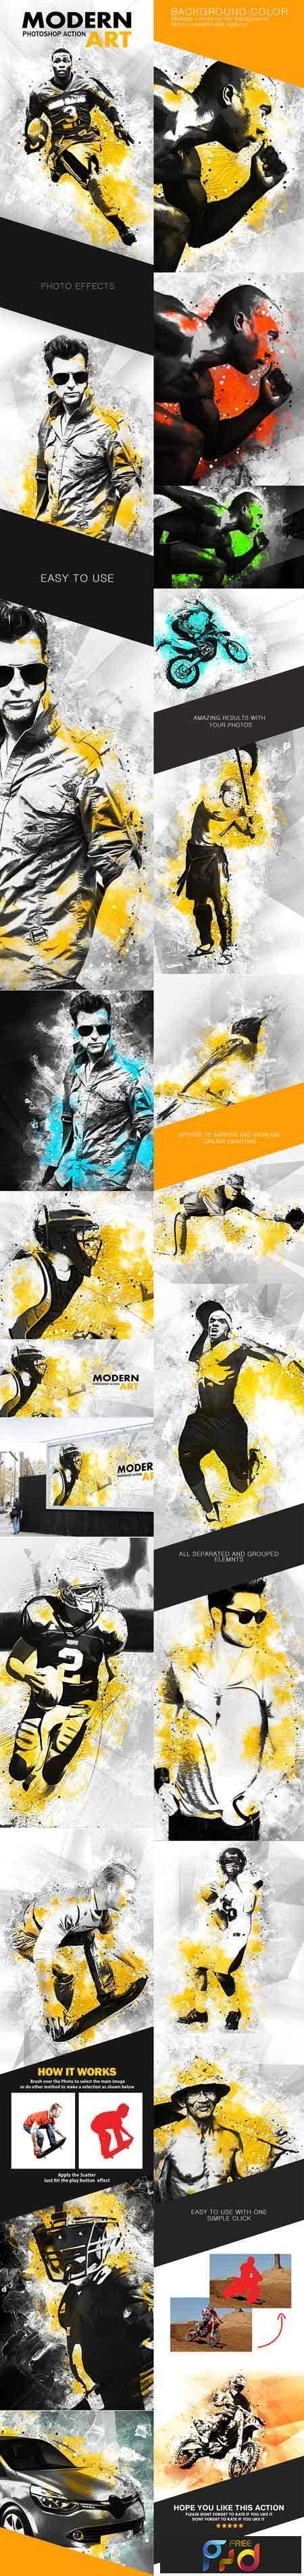 freepsdvn-com_1470791834_modernart-photoshop-action-17333522